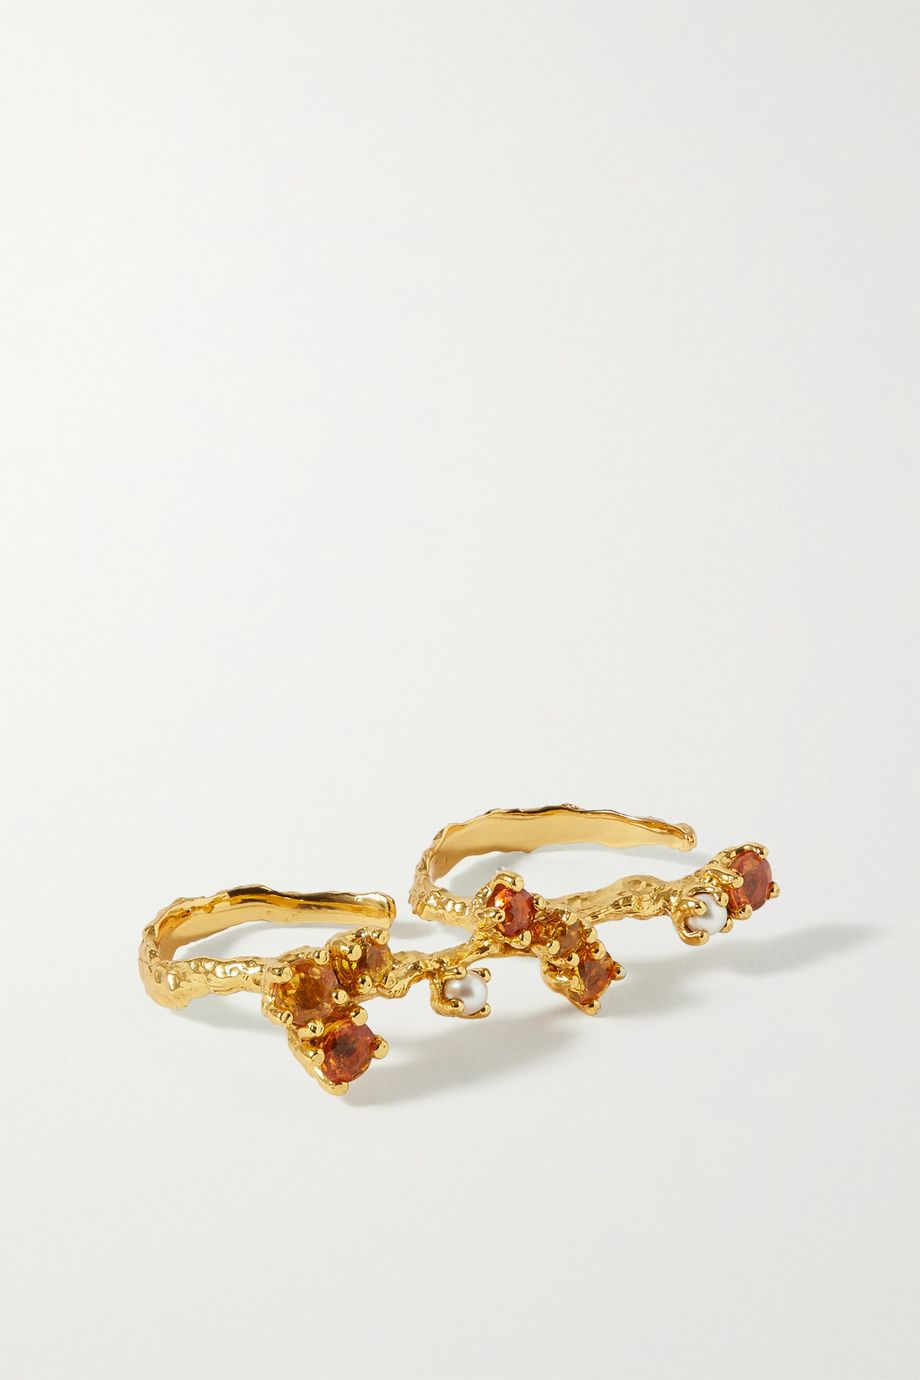 Pacharee Bloom 镀金多种宝石双指戒指